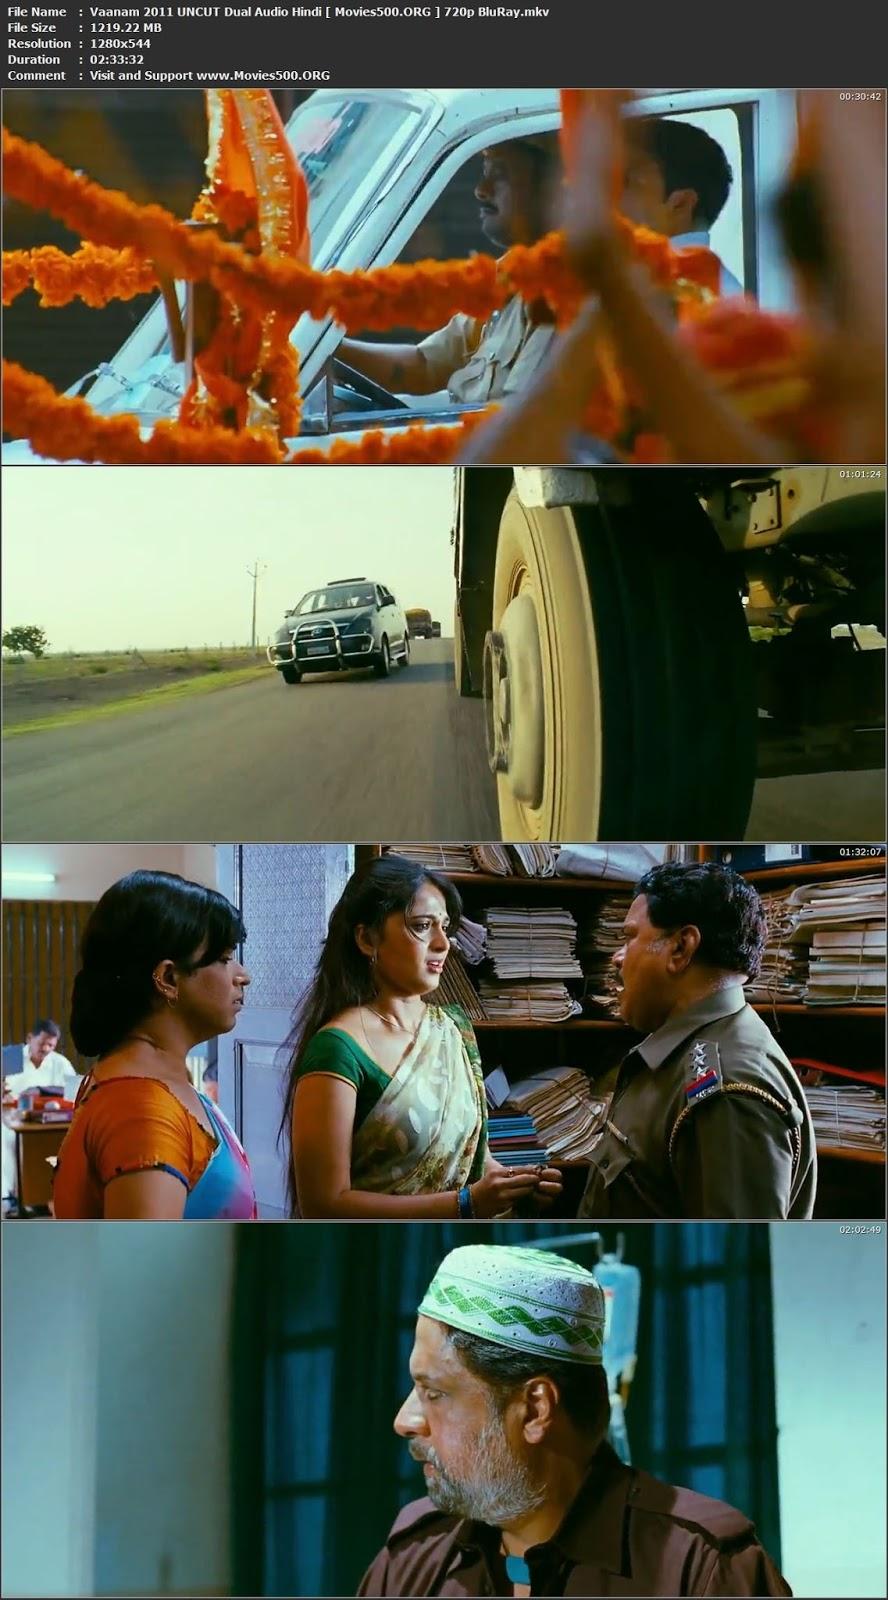 Vaanam 2011 UNCUT Dual Audio Hindi Download BluRay 720p 1GB at movies500.info